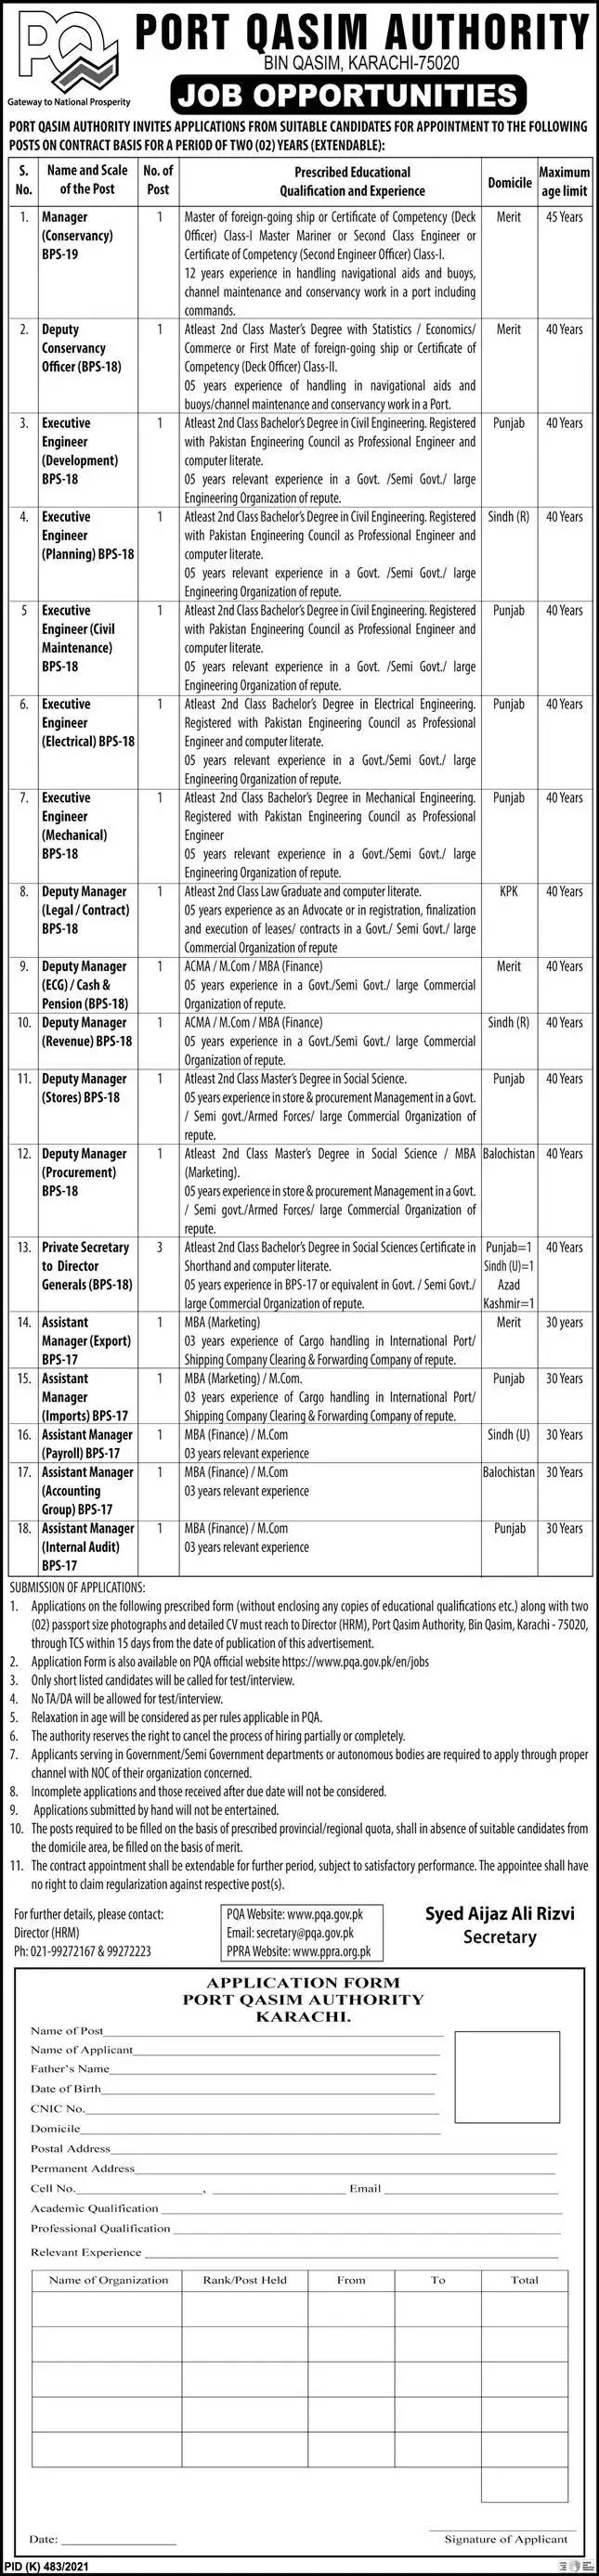 Port Qasim Authority PQA Jobs 2021